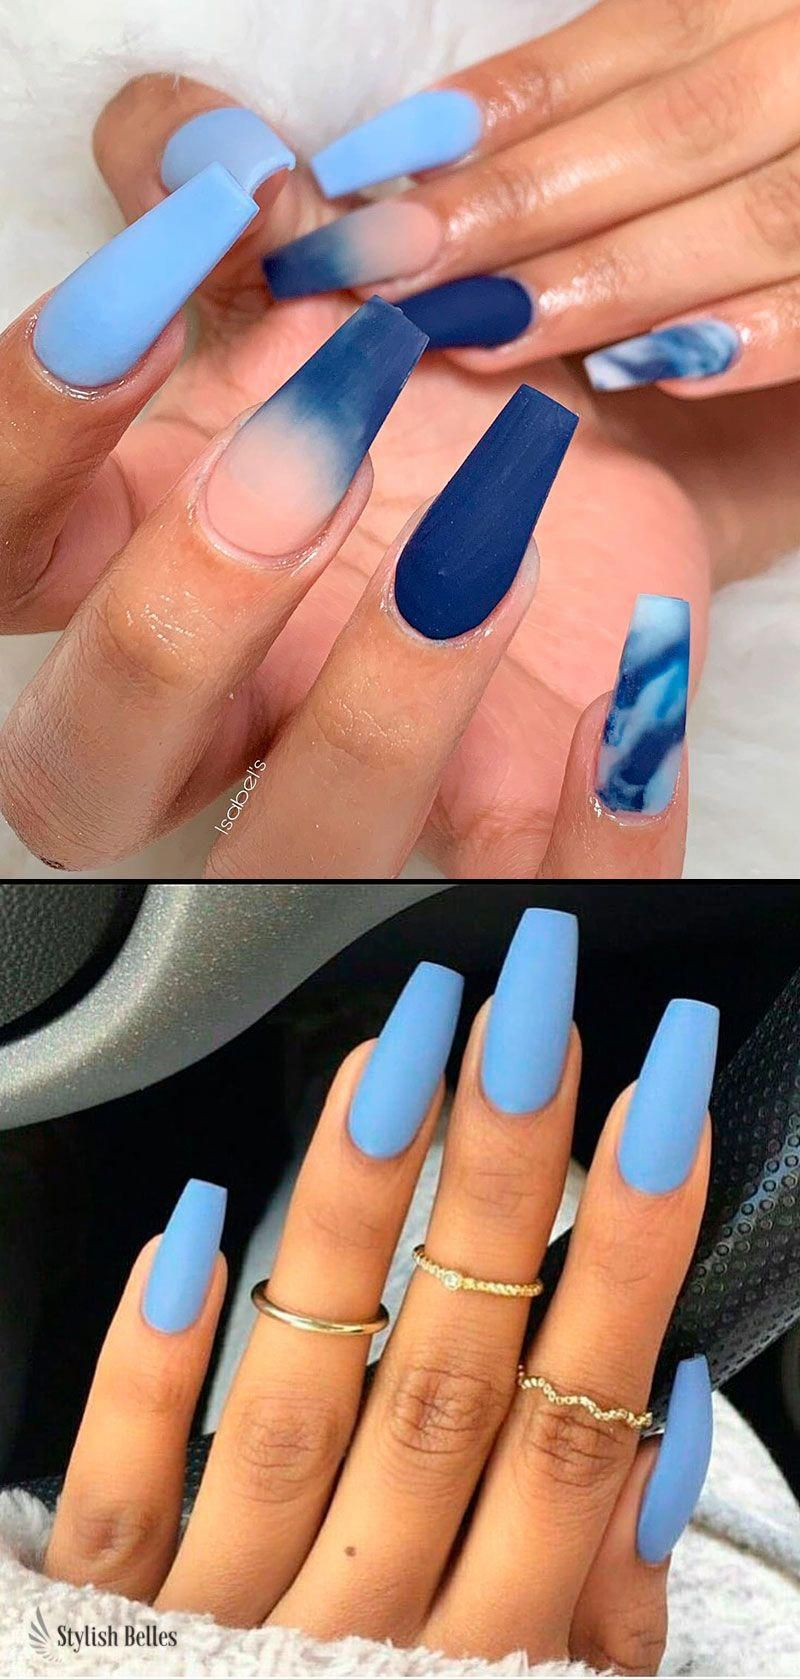 Beautiful Matte Light Blue Coffin Nails Ideas Cutenails In 2020 Blue Coffin Nails Blue Acrylic Nails Coffin Nails Designs